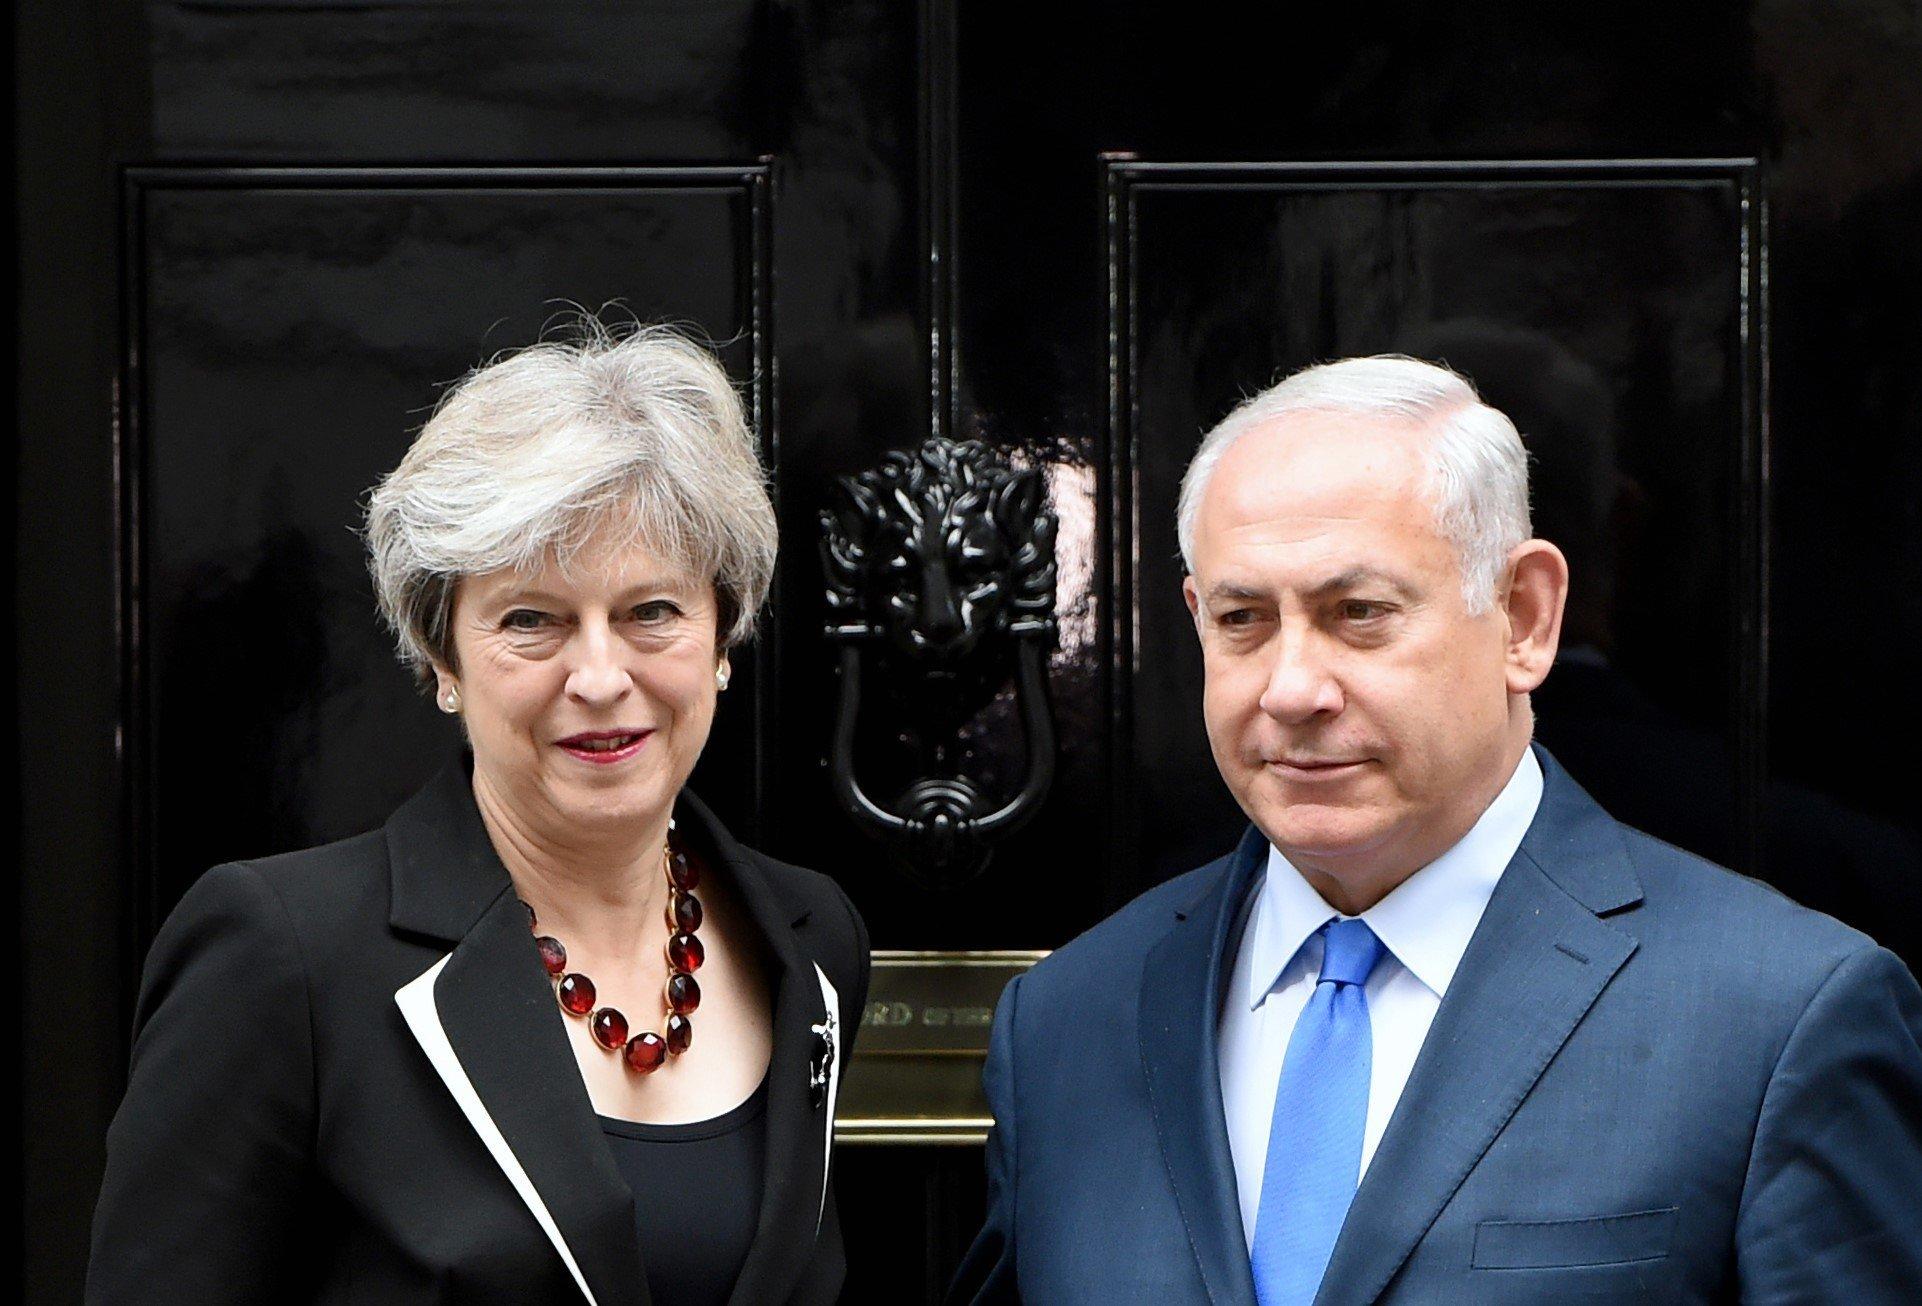 Theresa May greetsIsraeli Prime Minister Benjamin Netanyahu. She did not know at the time that Priti Patel has also met him.